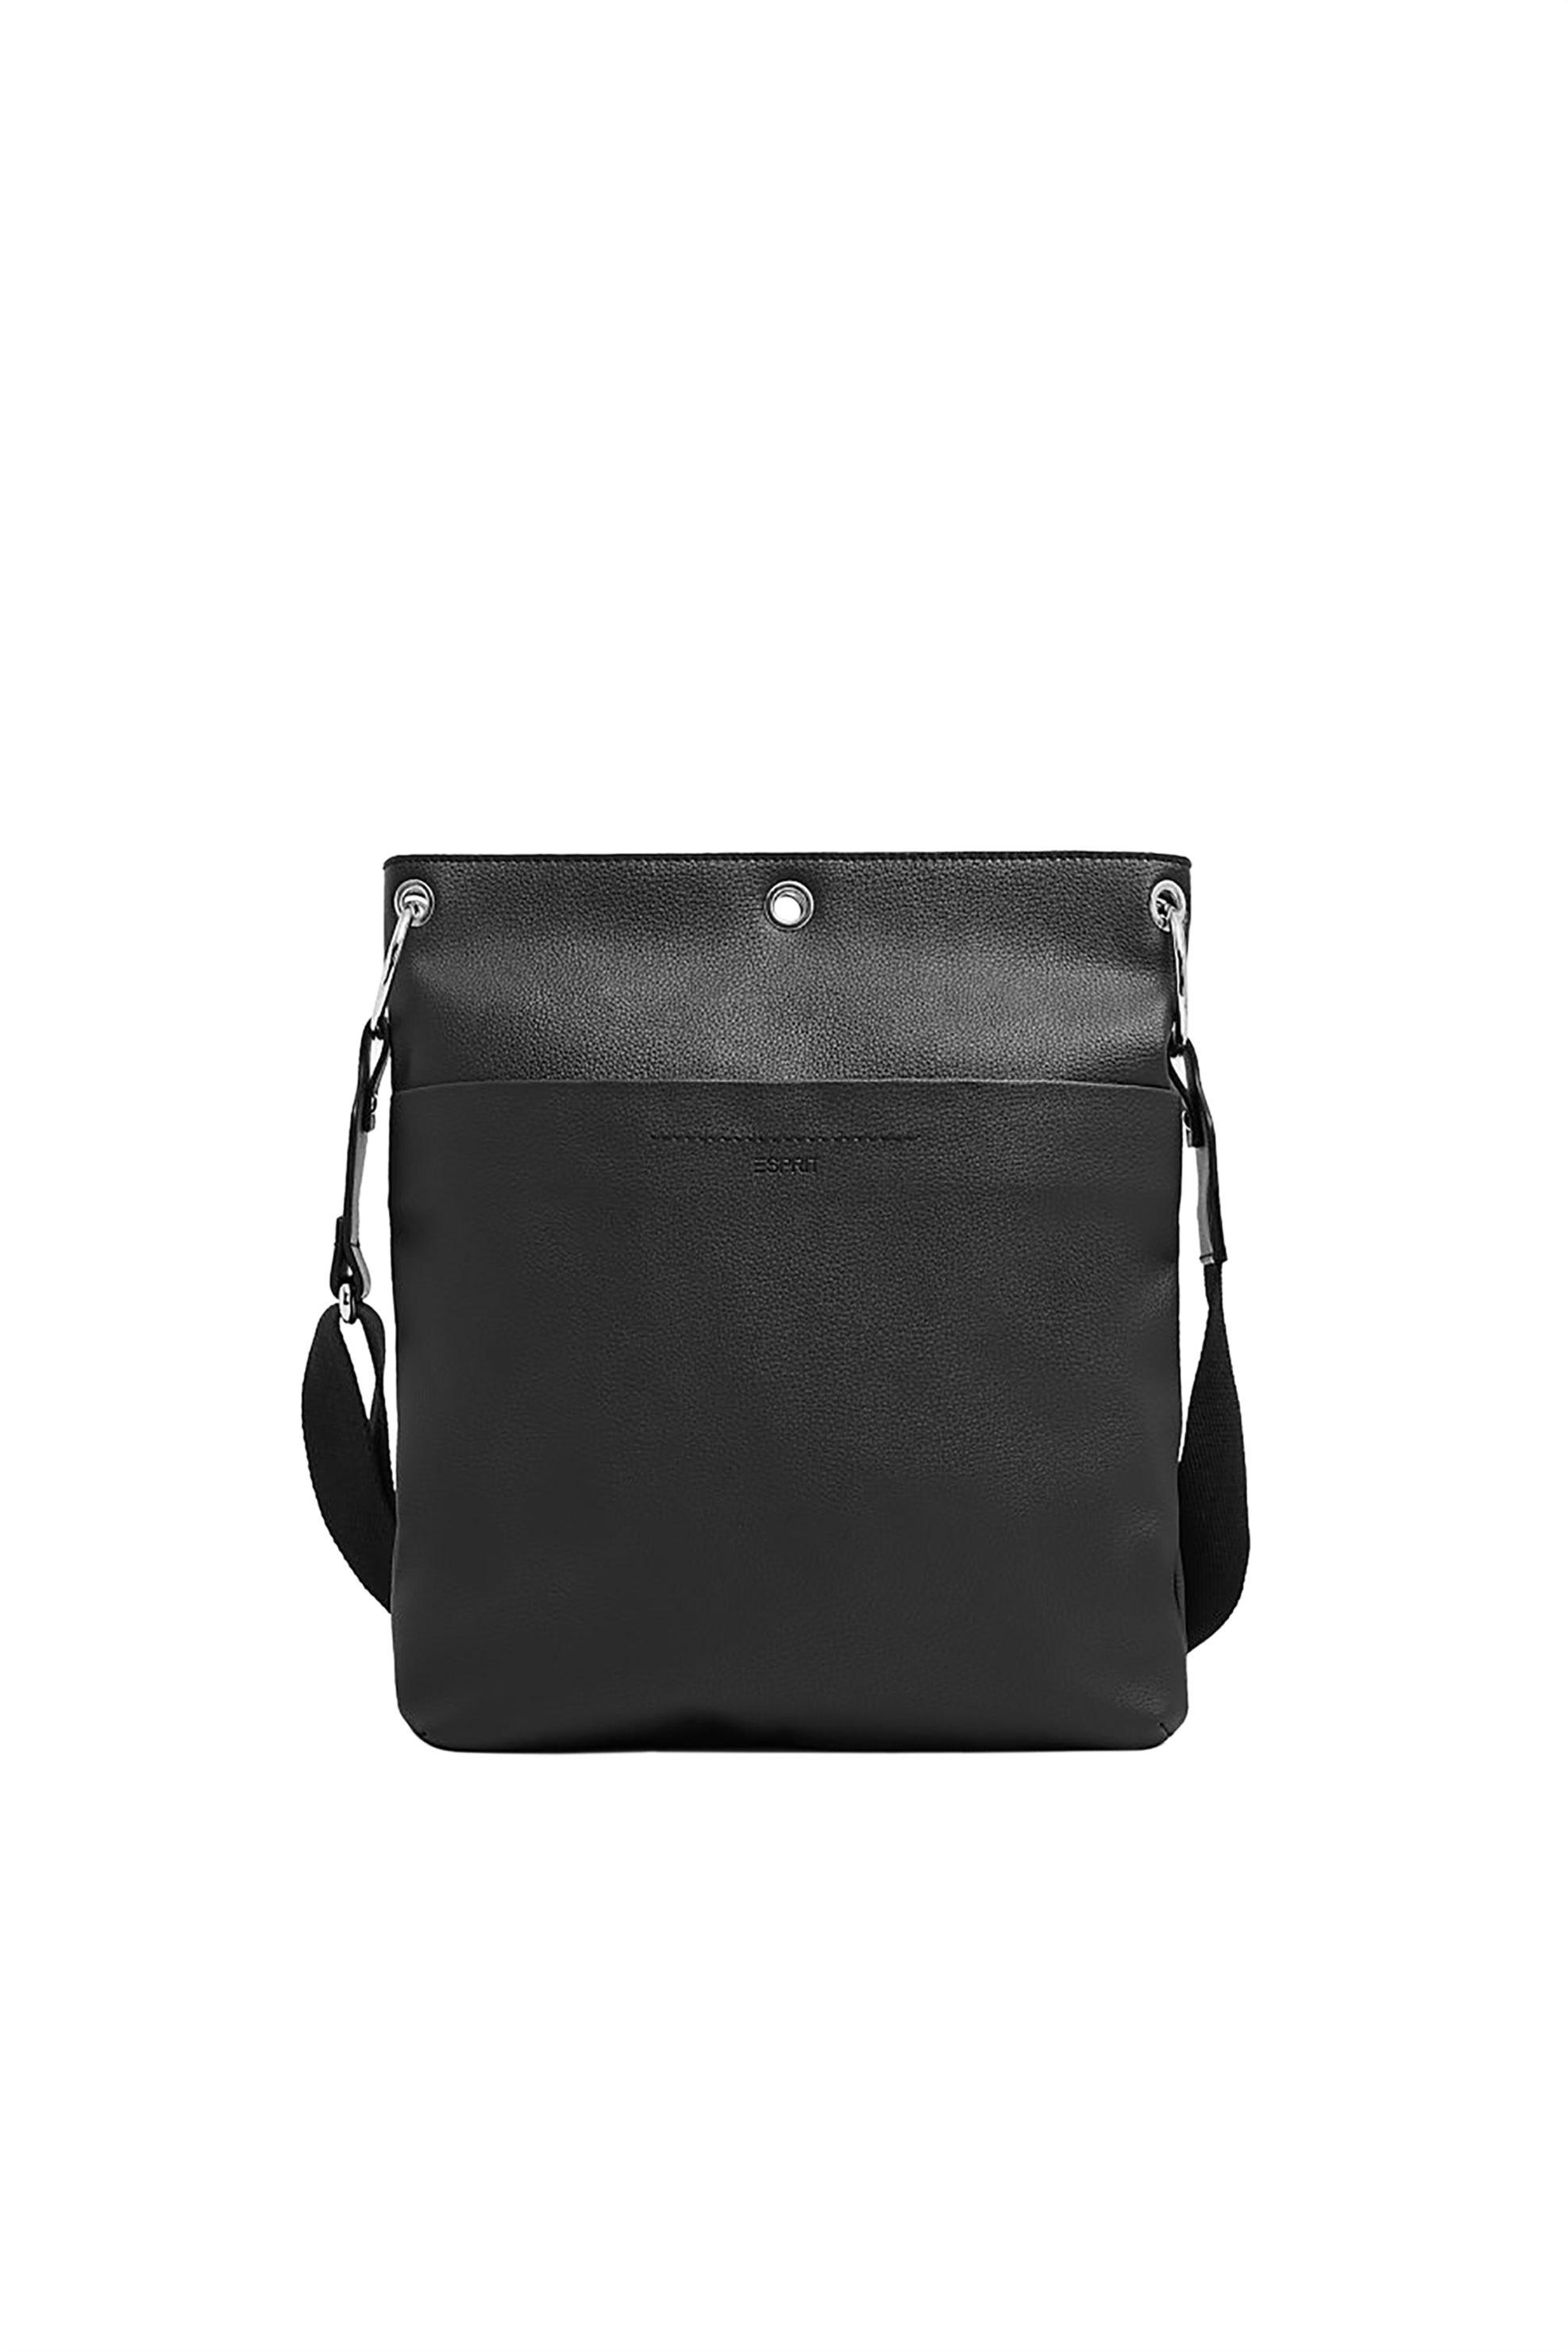 810ab546e0 Esprit γυναικεία crossbody τσάντα με ιμάντα - 019EA1O027 - Μαύρο